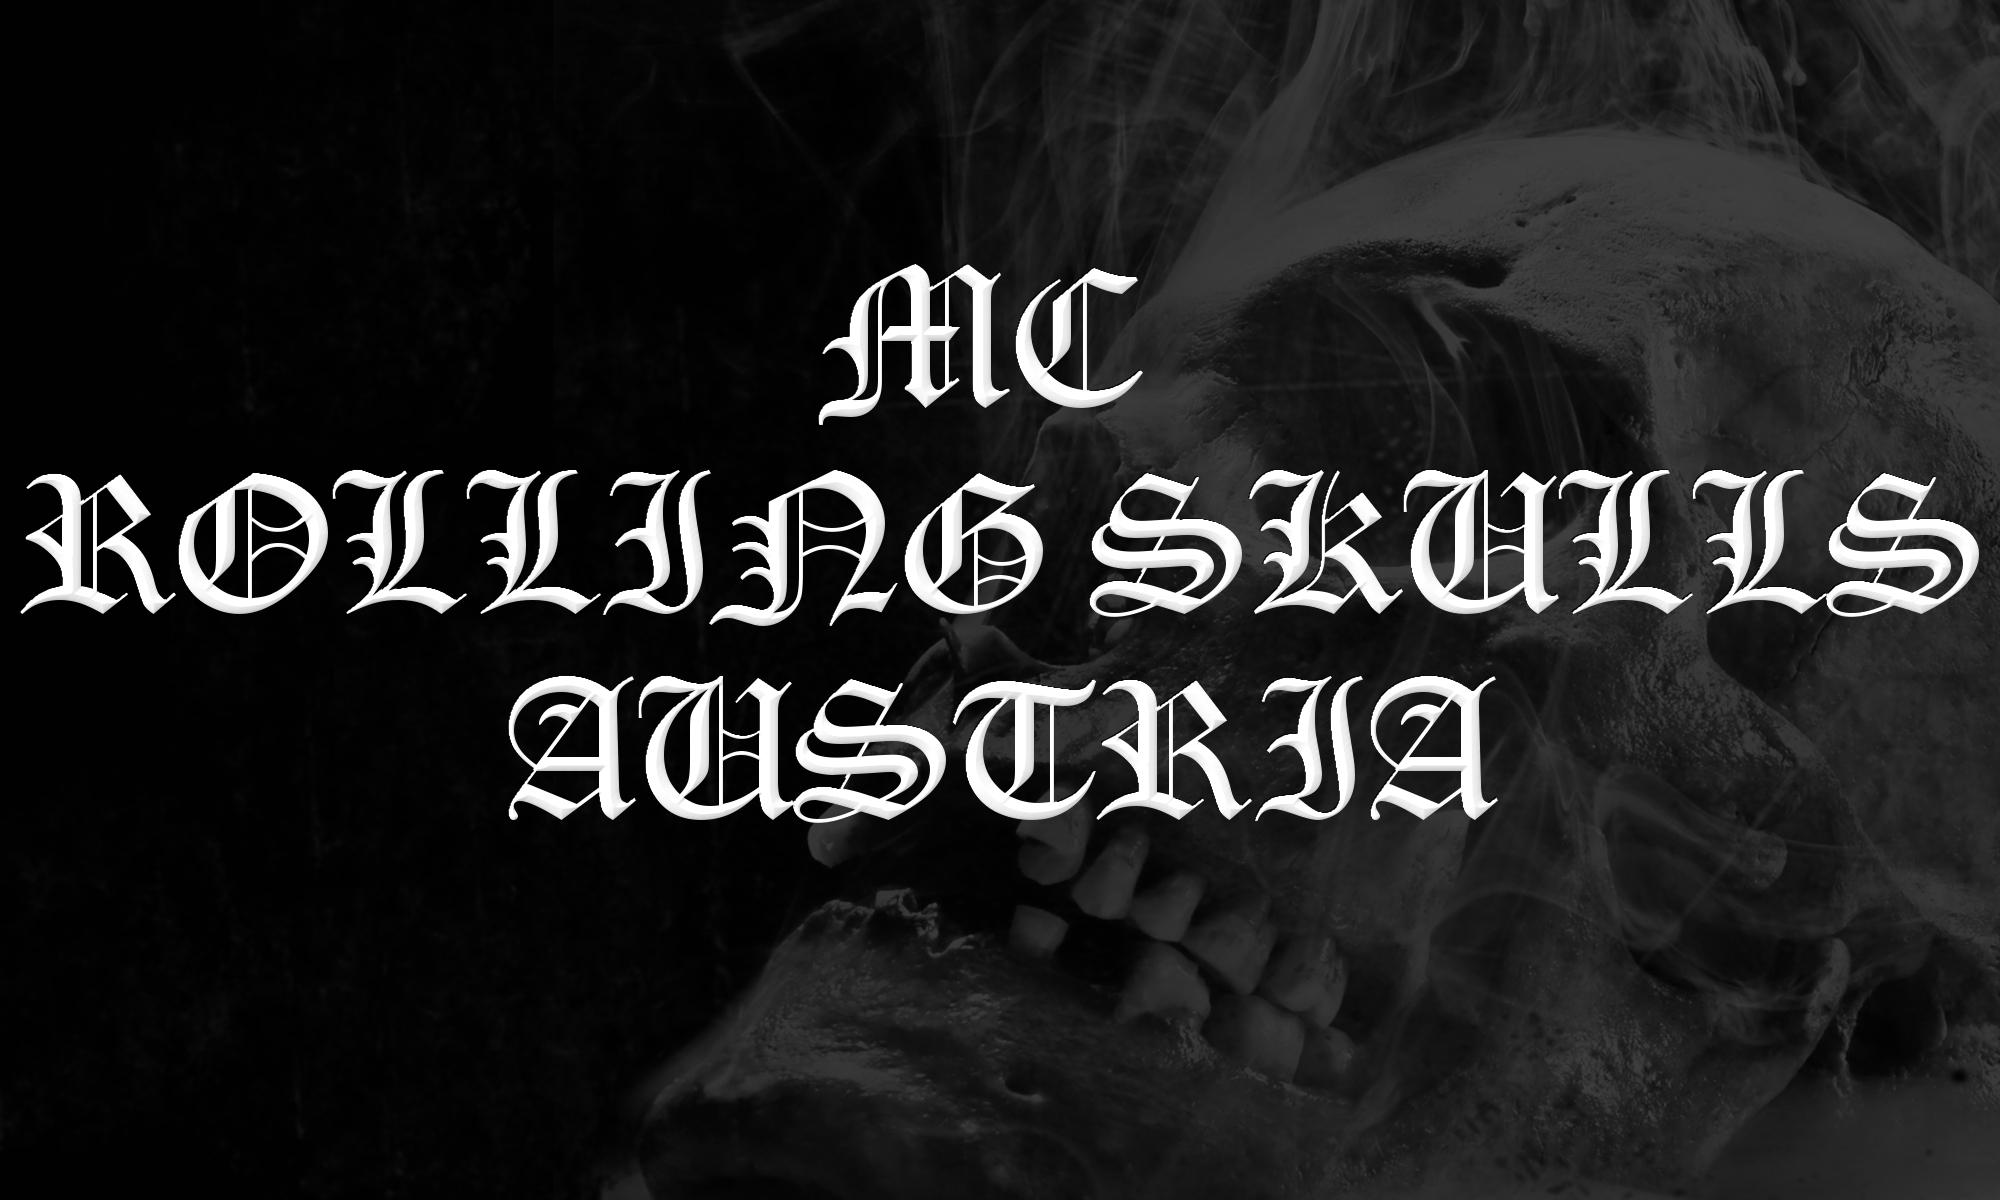 MC ROLLING SKULLS AUSTRIA